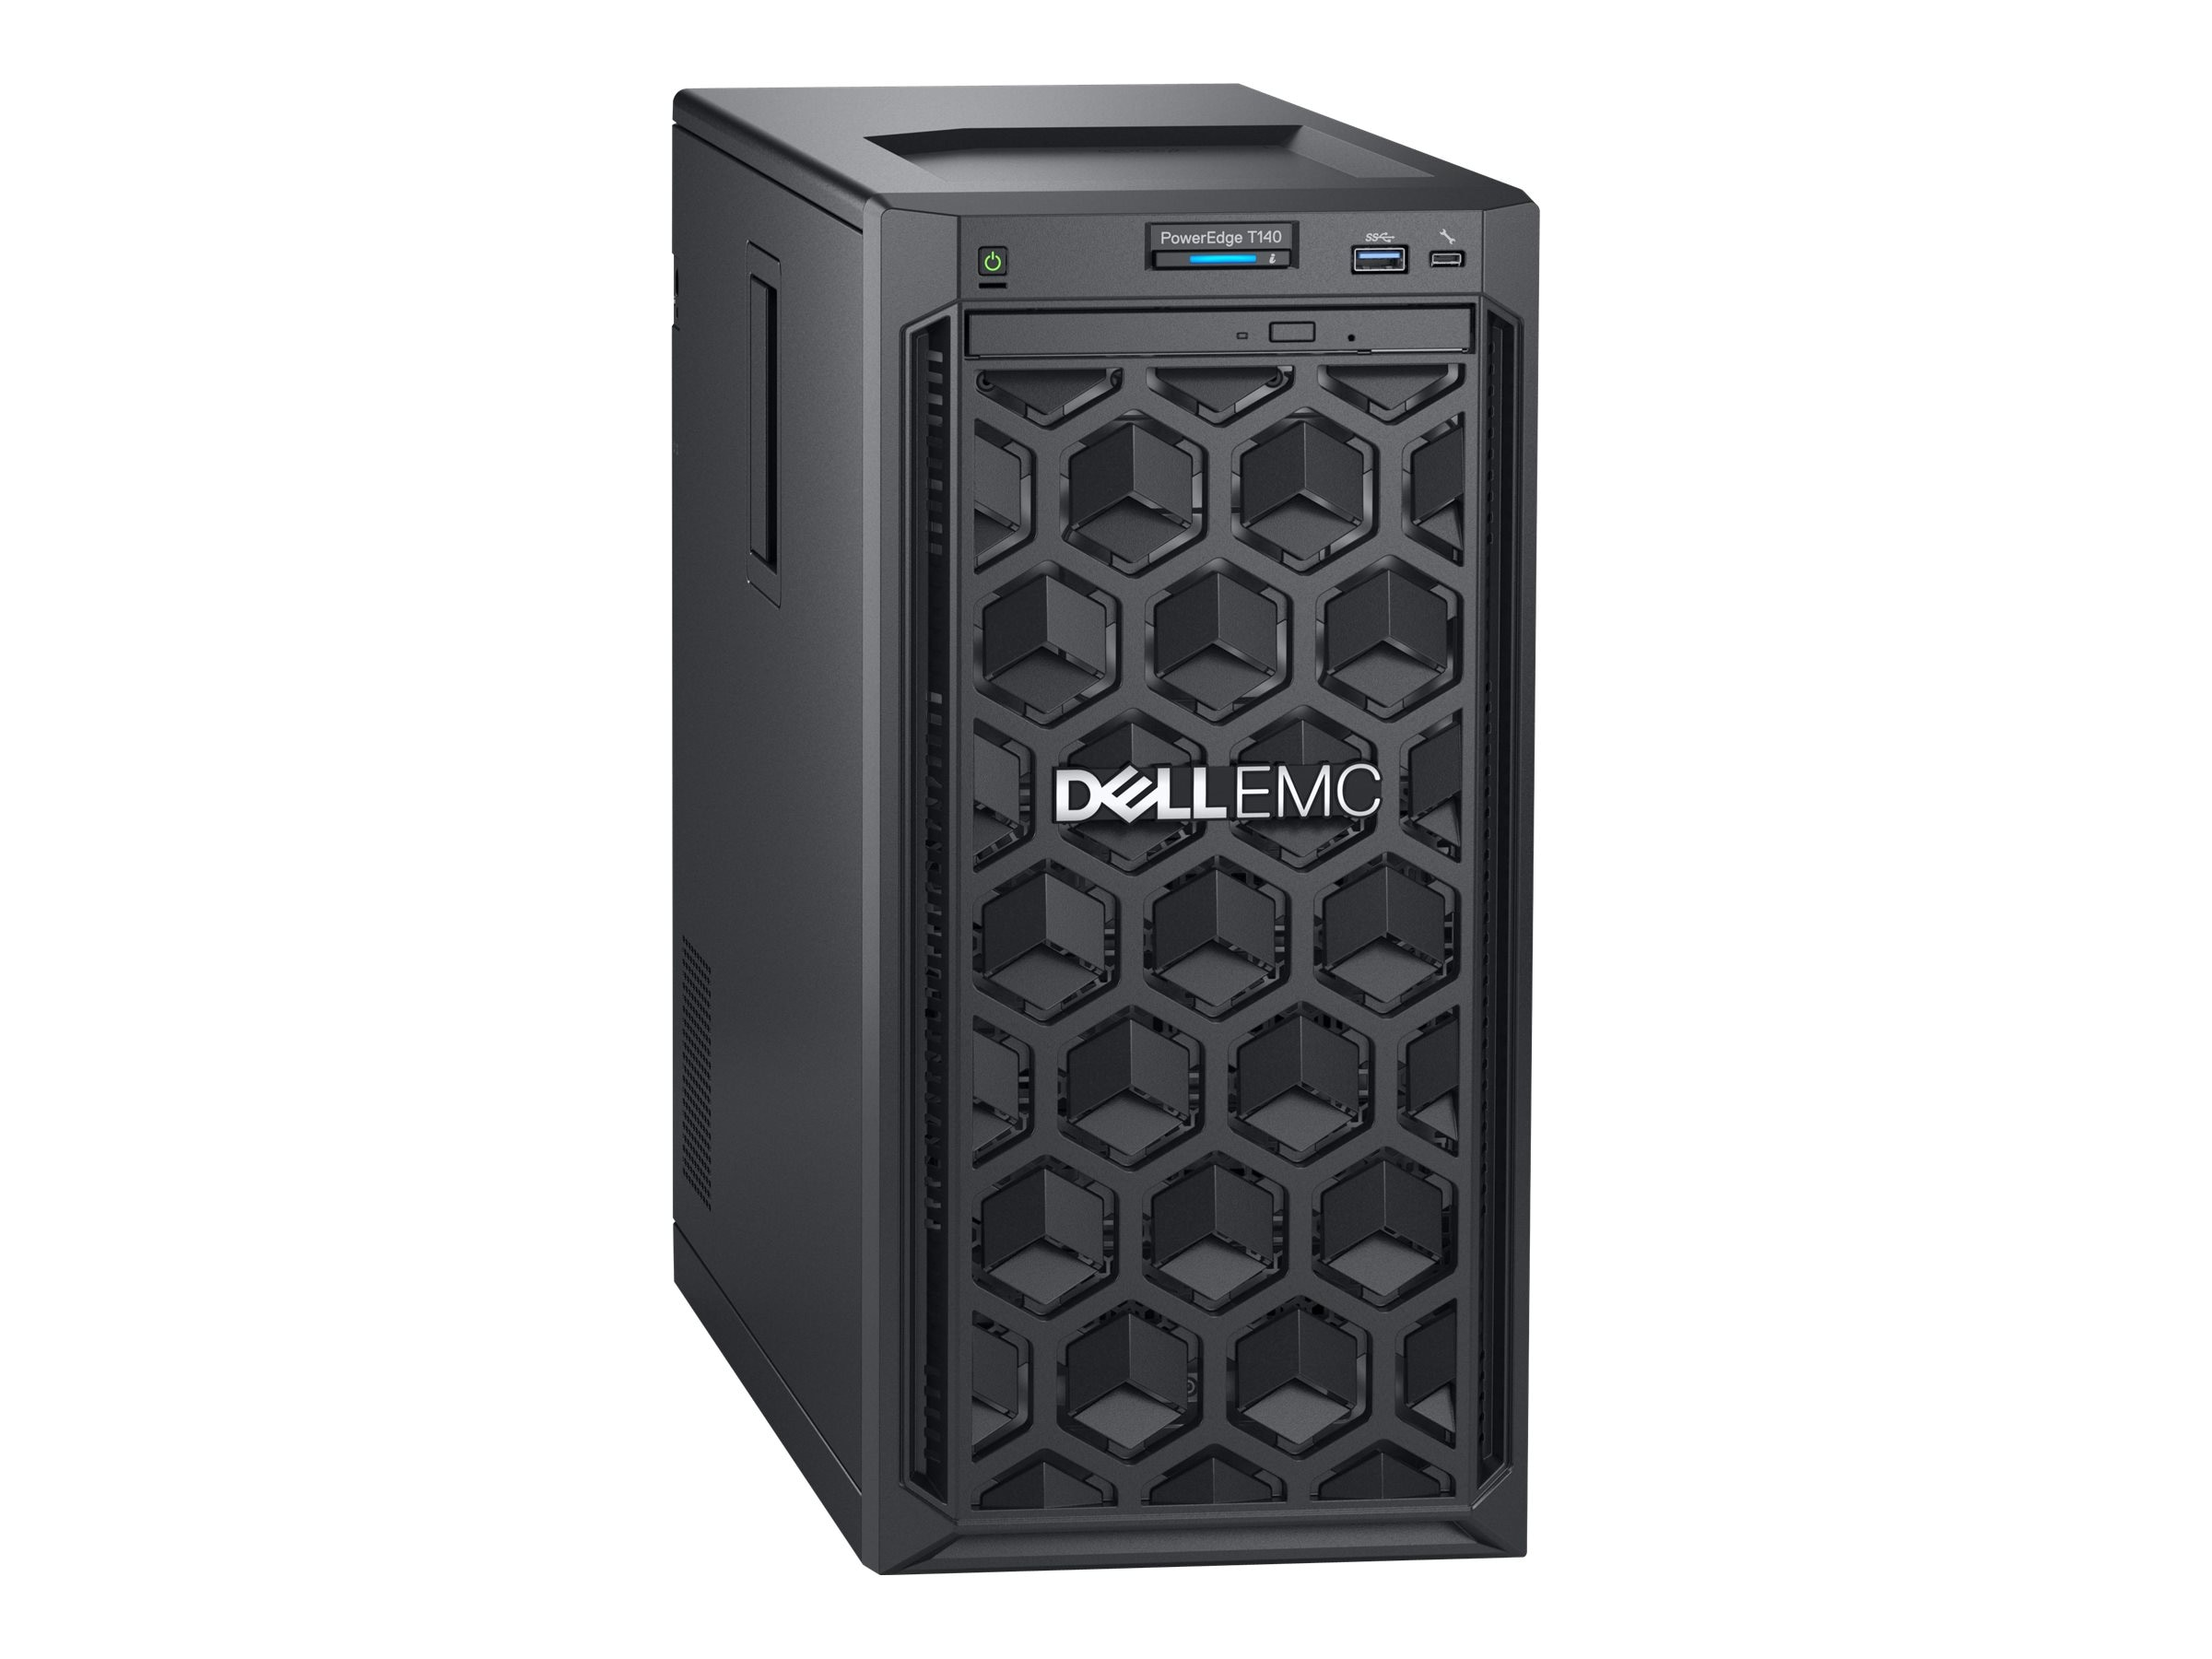 Dell PowerEdge T140 Tower Xeon QC E-2124 3 3GHz 8GB 1TB 4x3 5